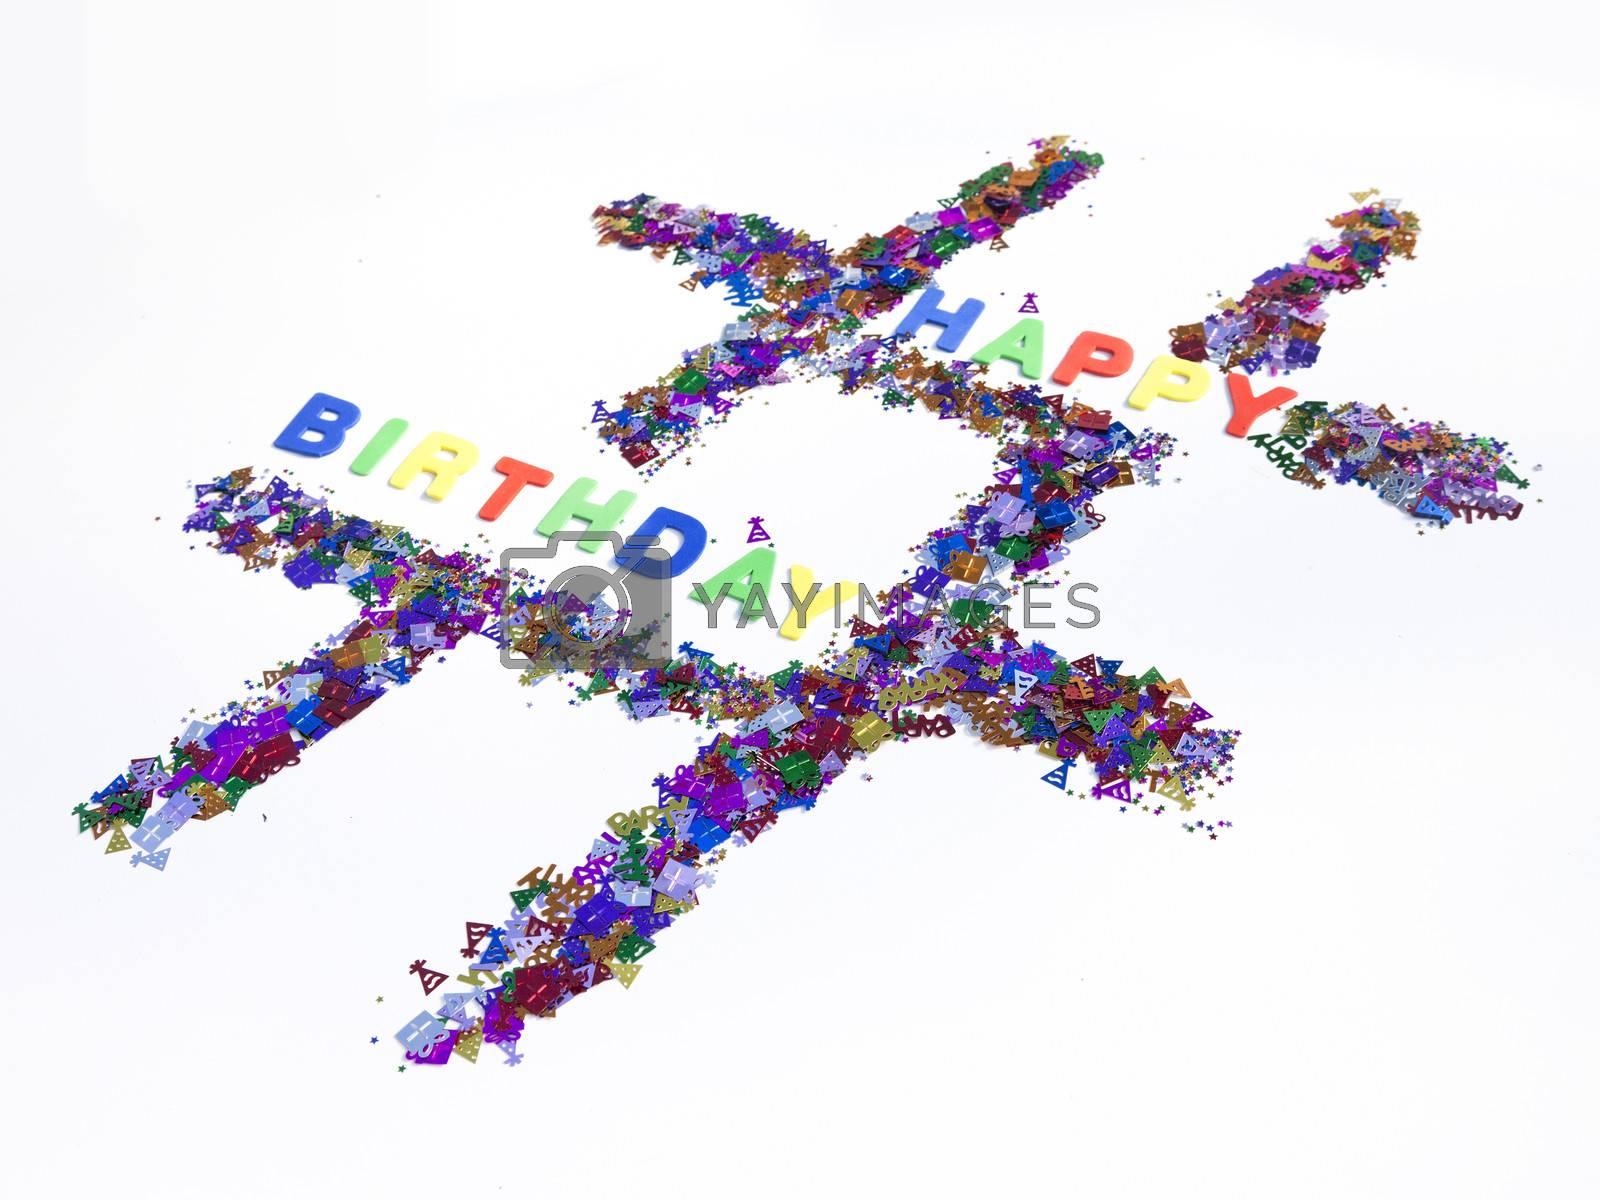 Royalty free image of Happy Birthday Hashtag by mothy20